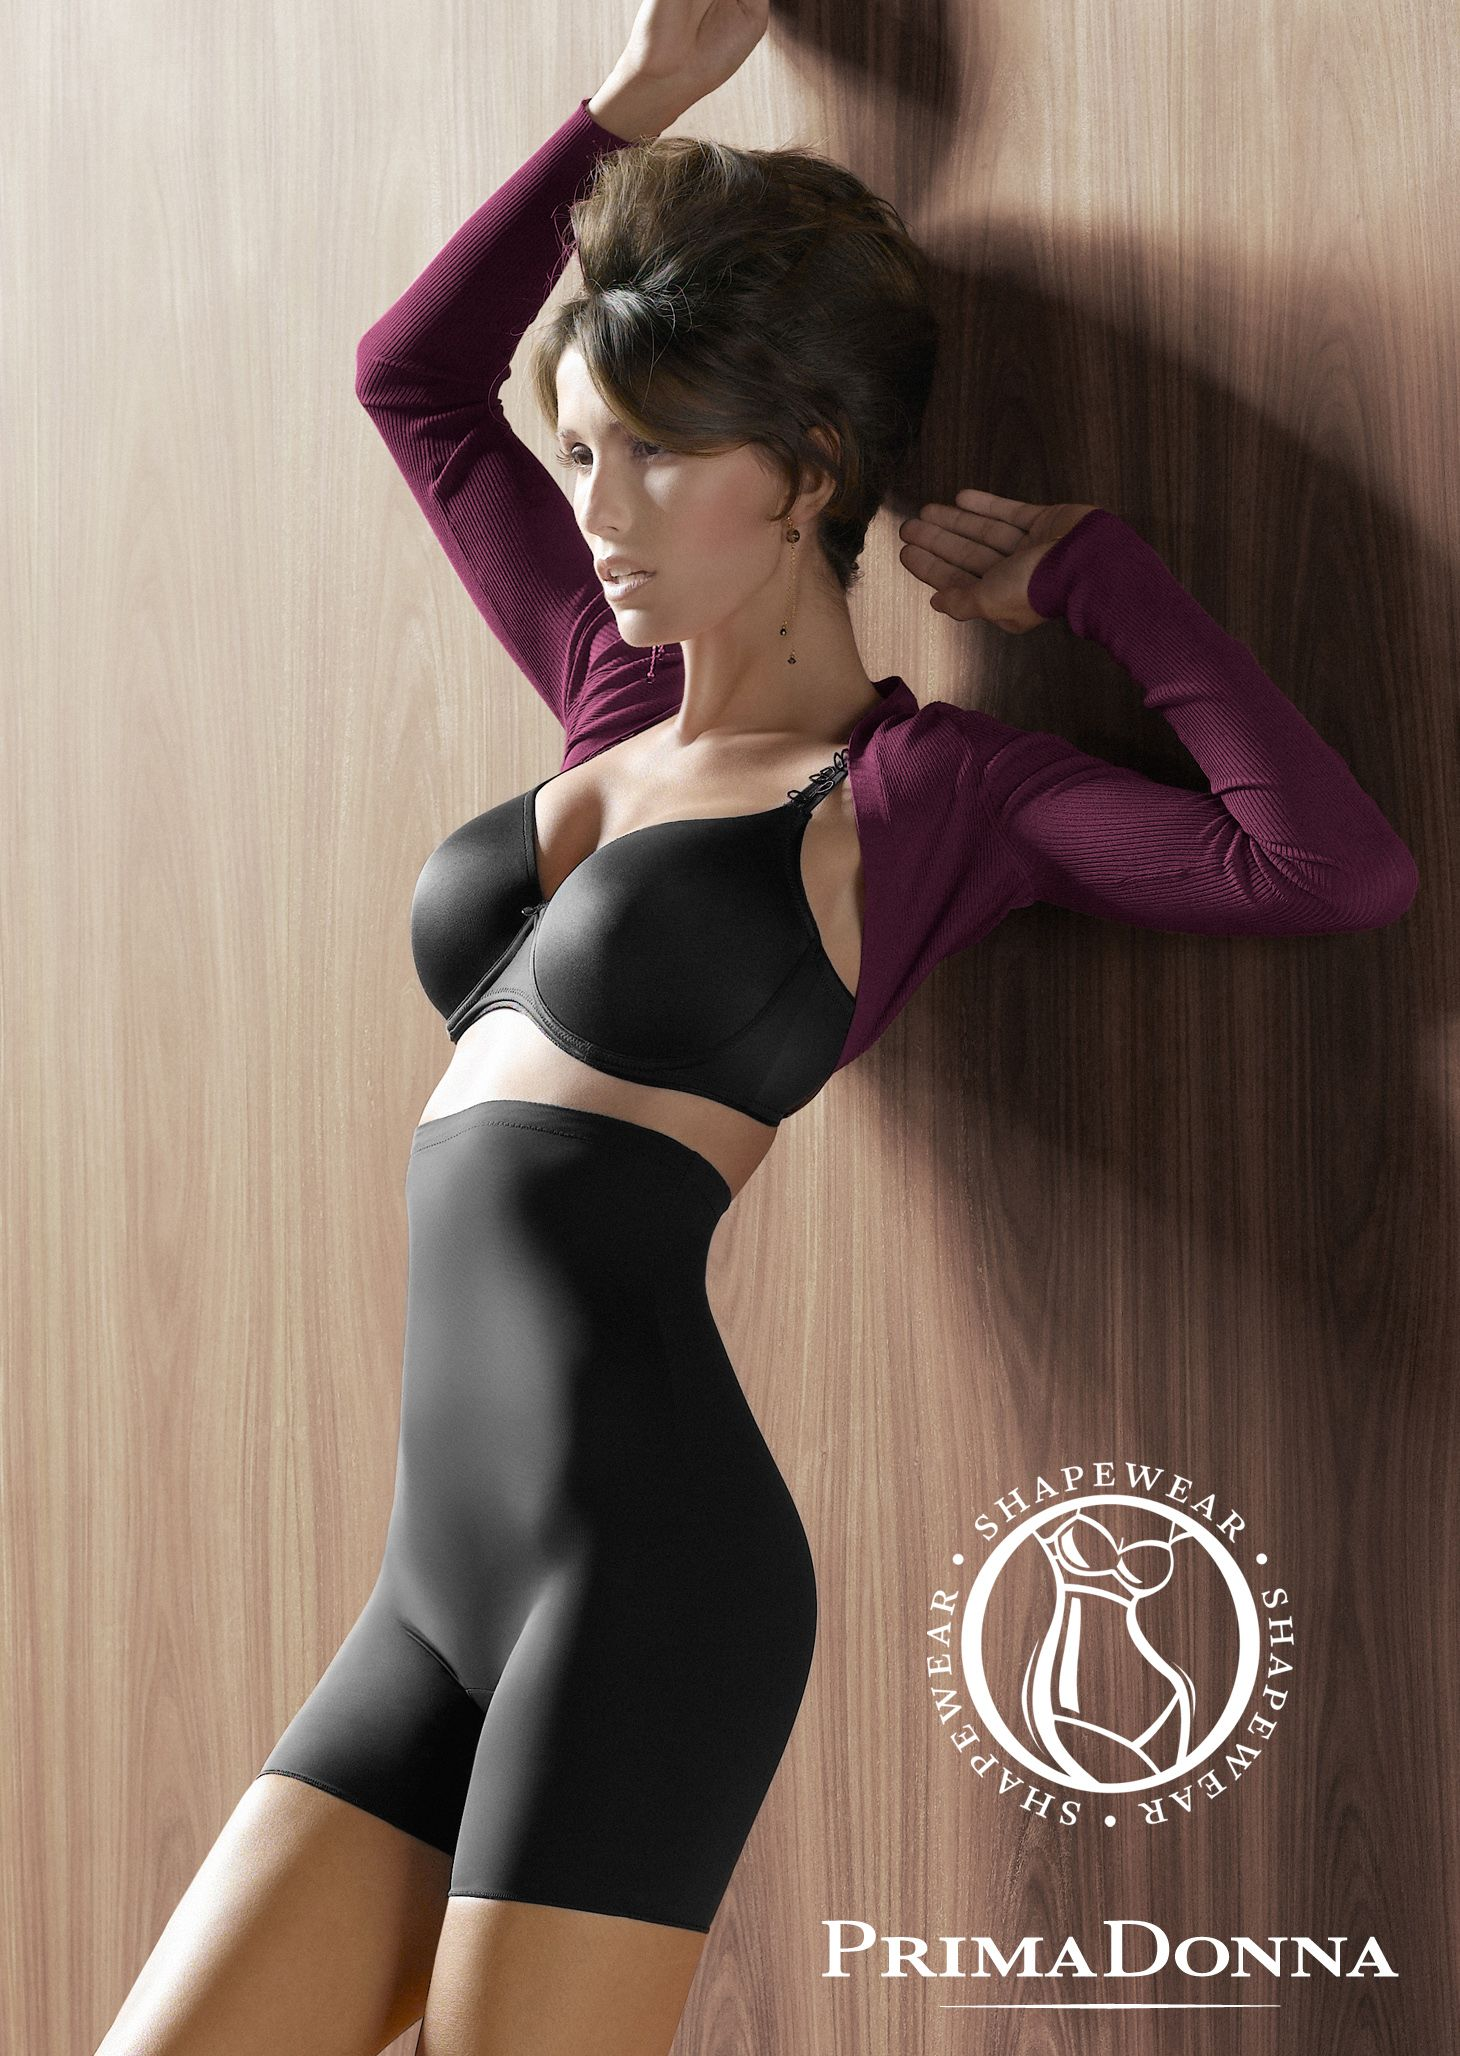 b60c65d358 PrimaDonna shapewear - Perle in Charcoal